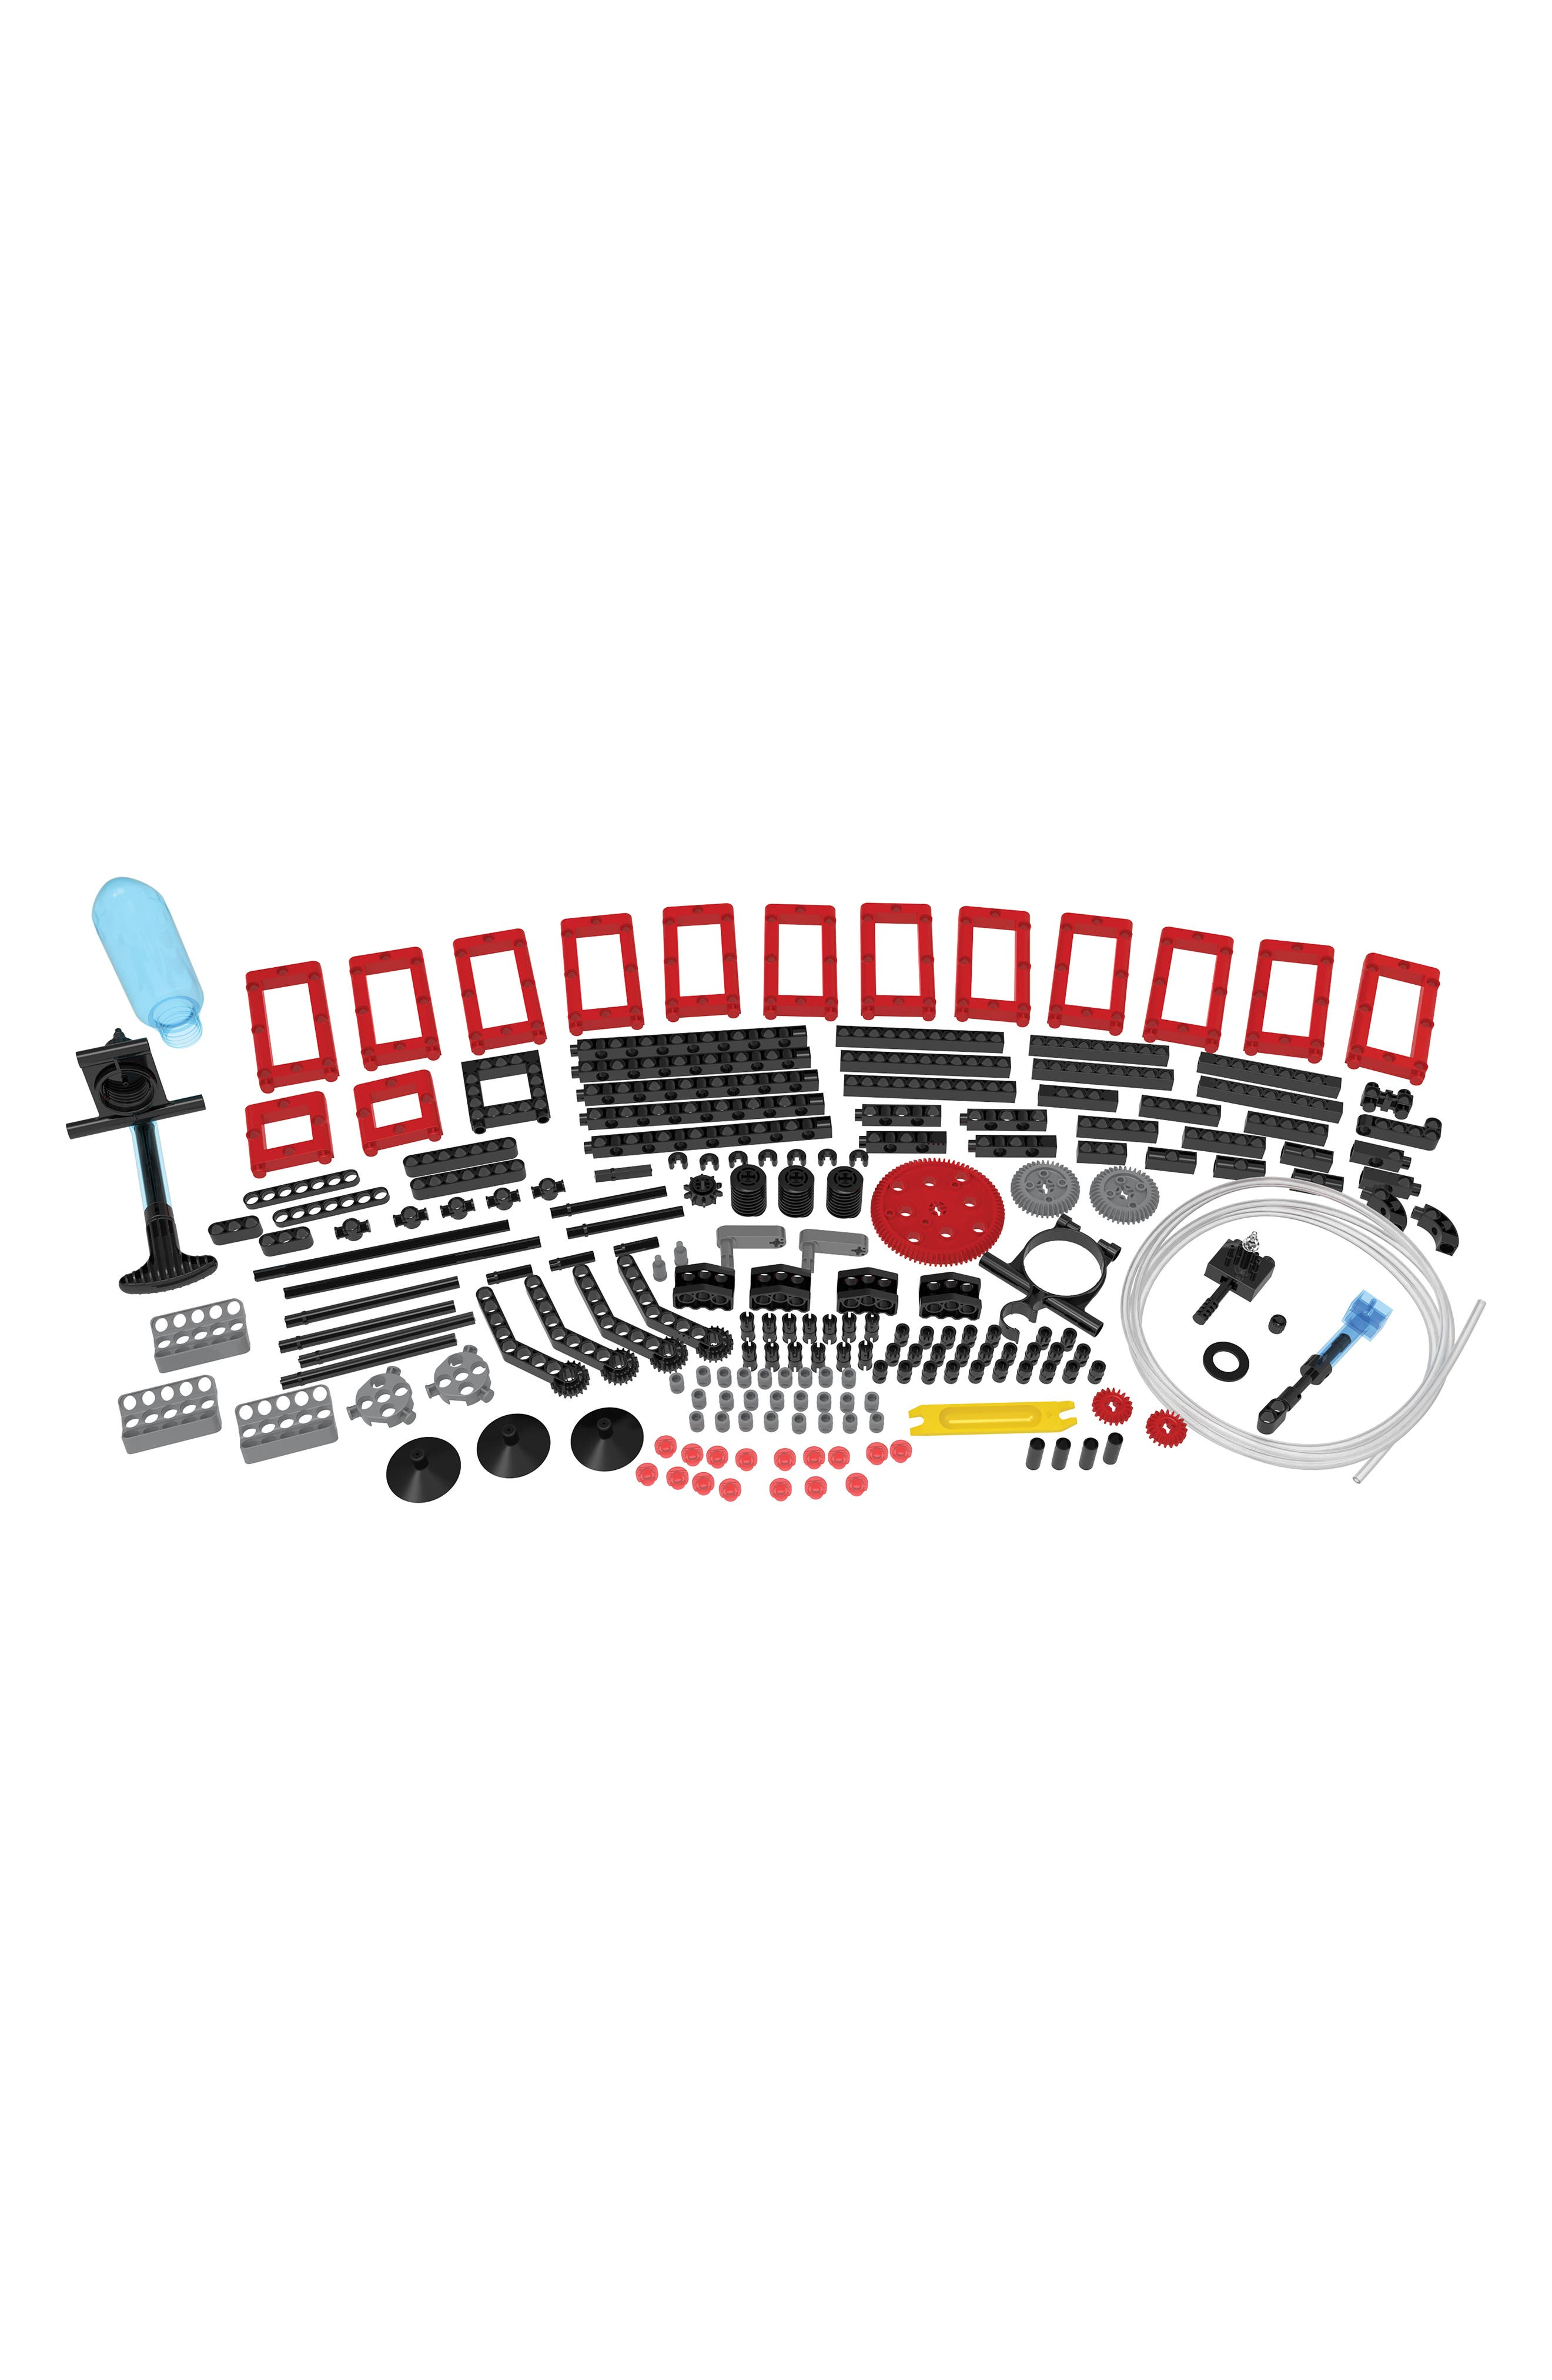 Mechanical Engineering Robotic Arms Kit,                             Alternate thumbnail 3, color,                             Multi